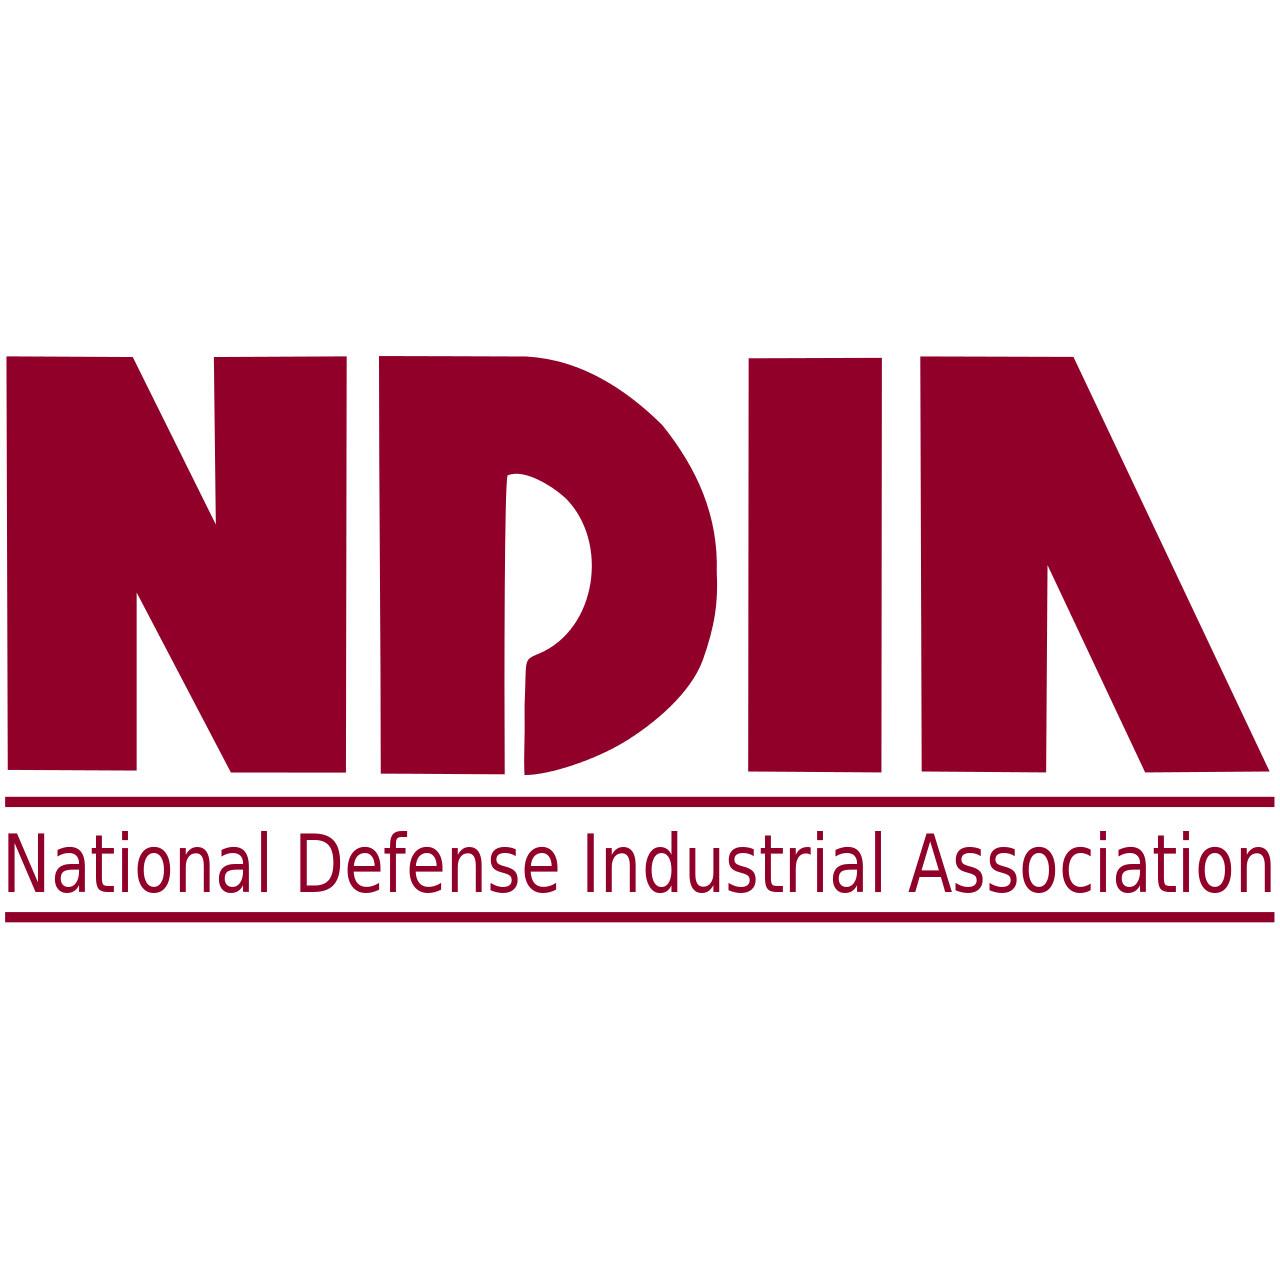 NDIA_logo_web.jpg